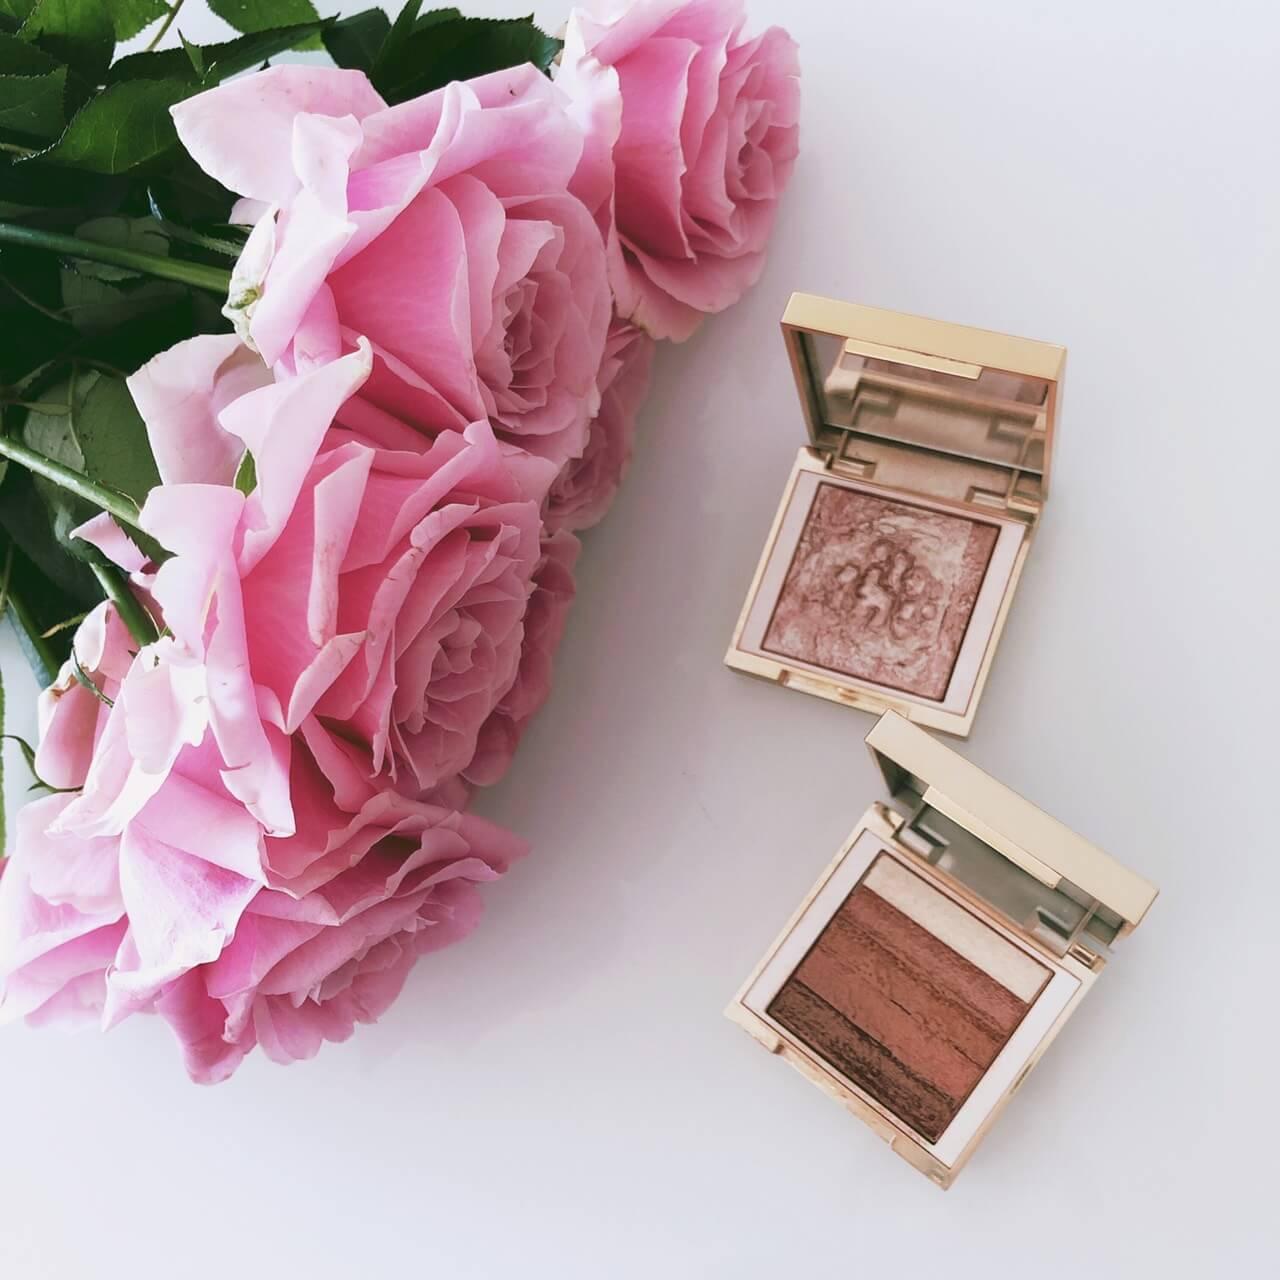 BOBBIE BROWN Mini Highlighting Powder PinkGlow、Mini Shimmer Brick Compact